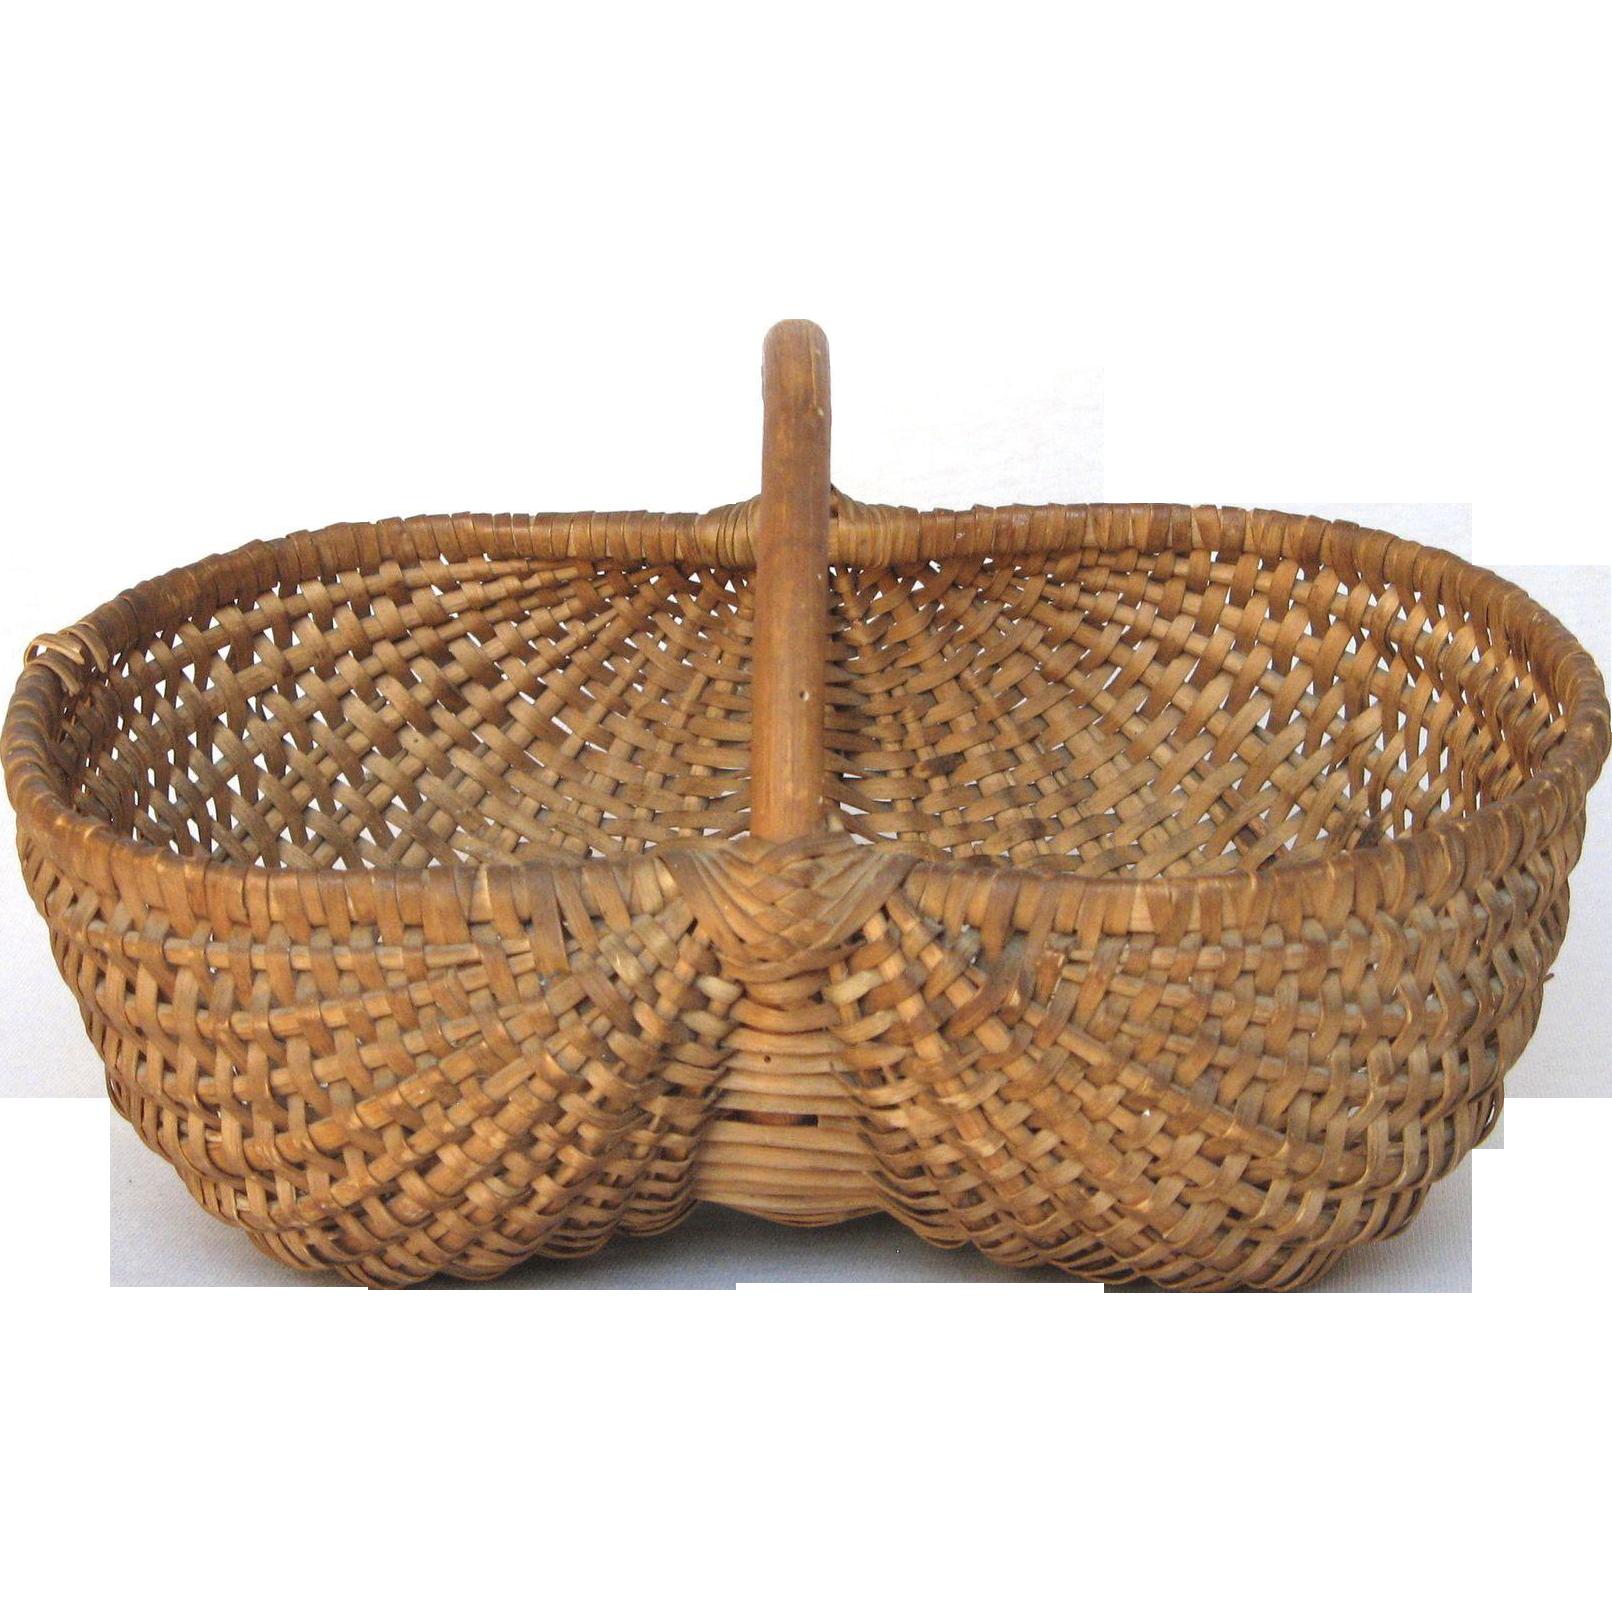 Woven Gathering Basket : French woven buttocks gathering basket bent wood handle